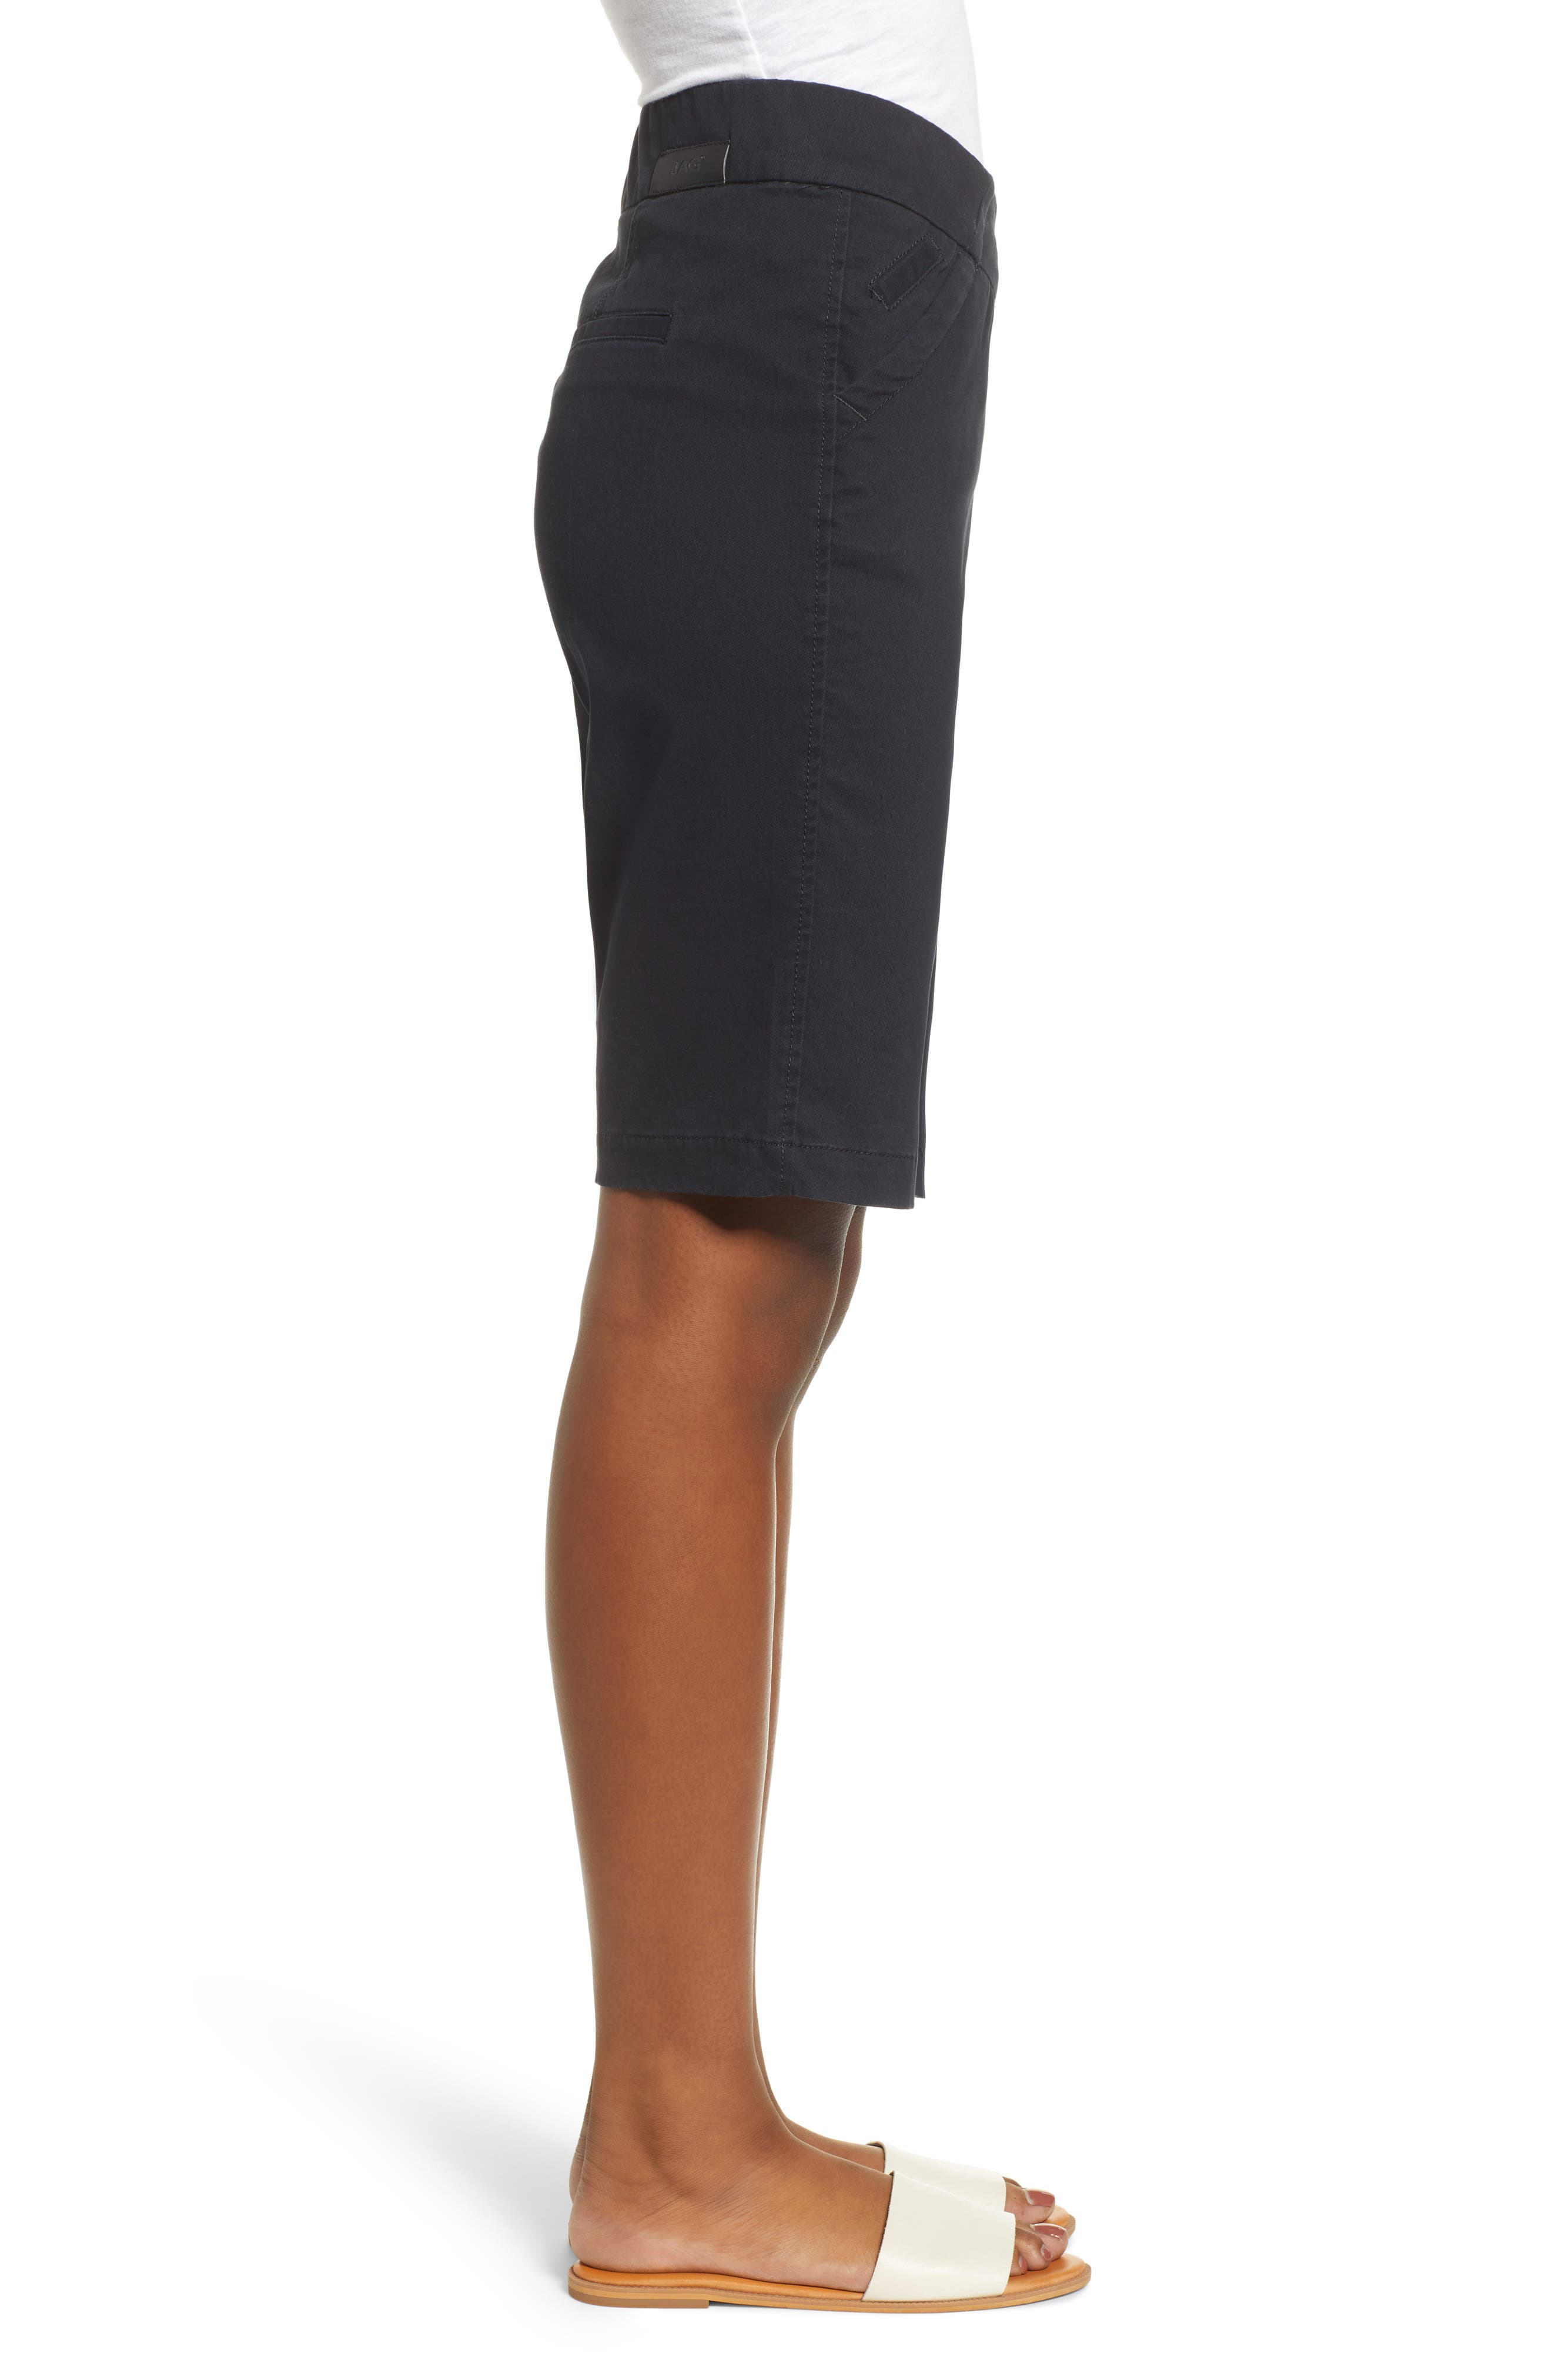 JAG JEANS, Gracie Bermuda Shorts, Alternate thumbnail 4, color, BLACK